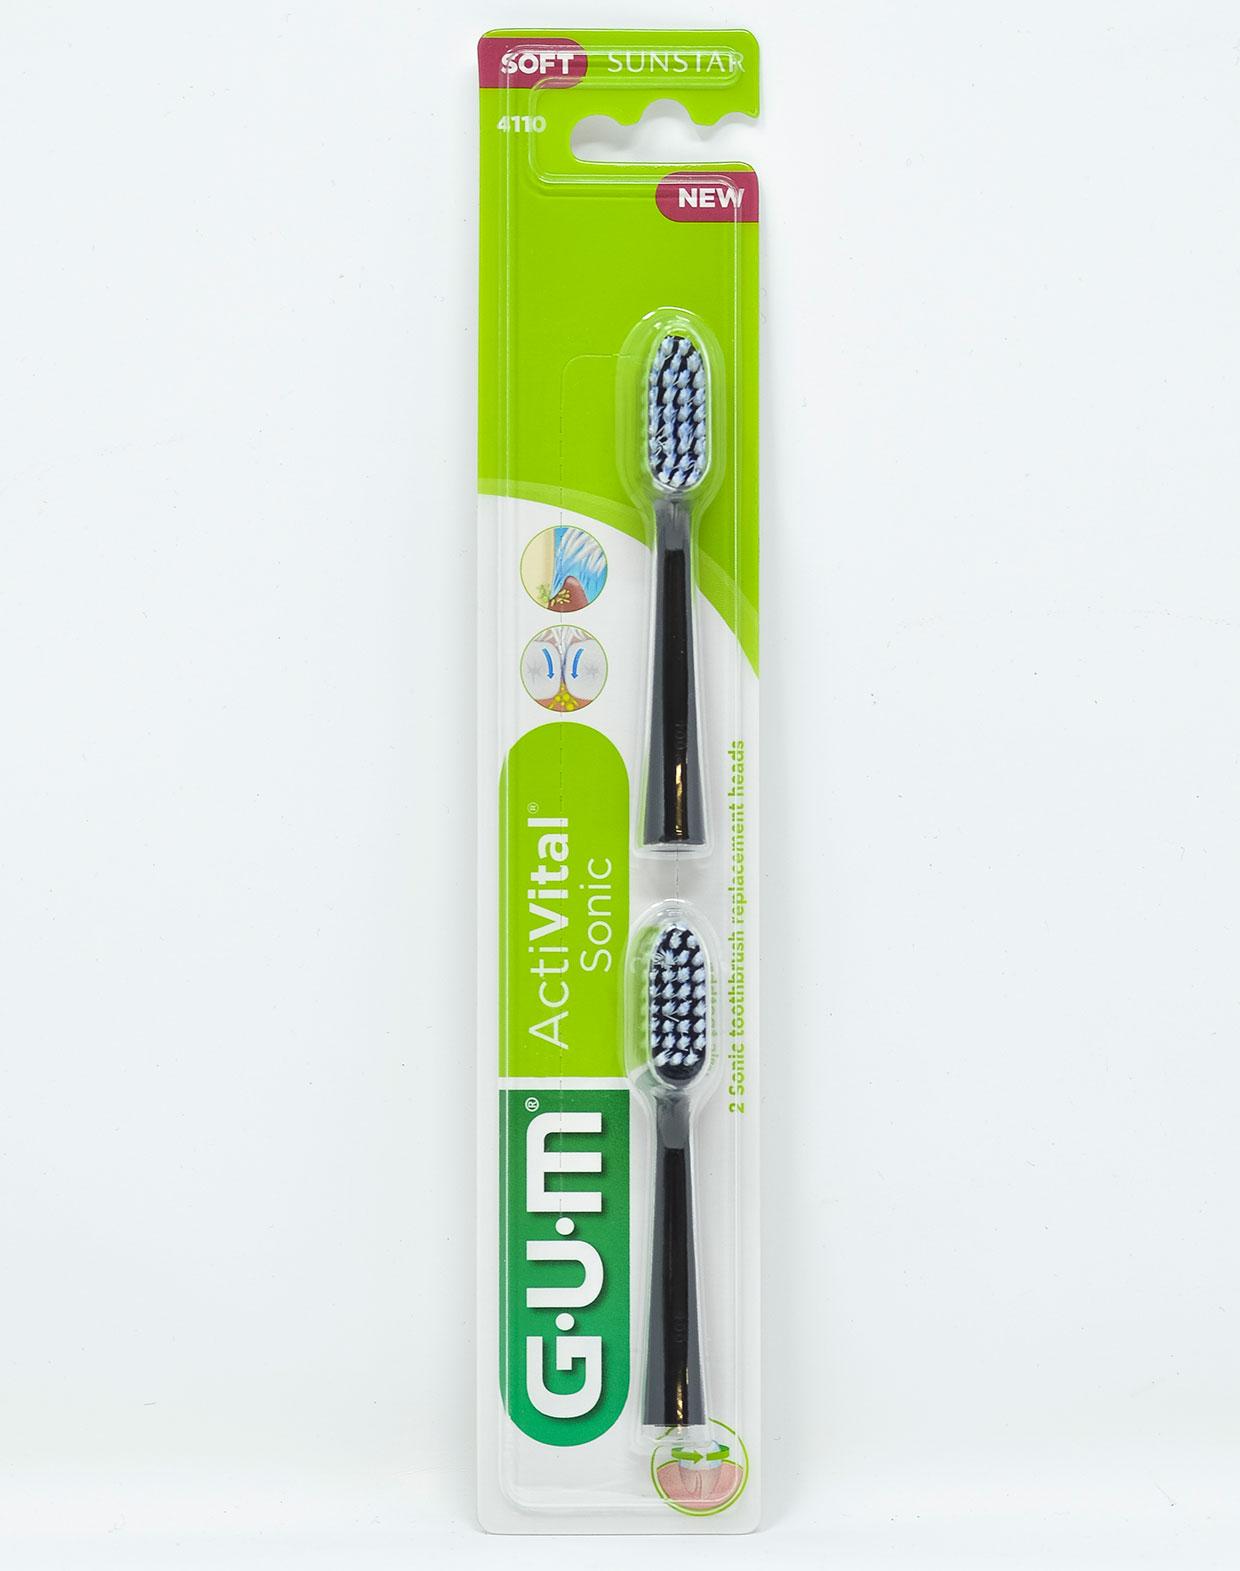 Gum Testina di Ricambio Spazzolino Sonico Gum ActiVital - 2 pz